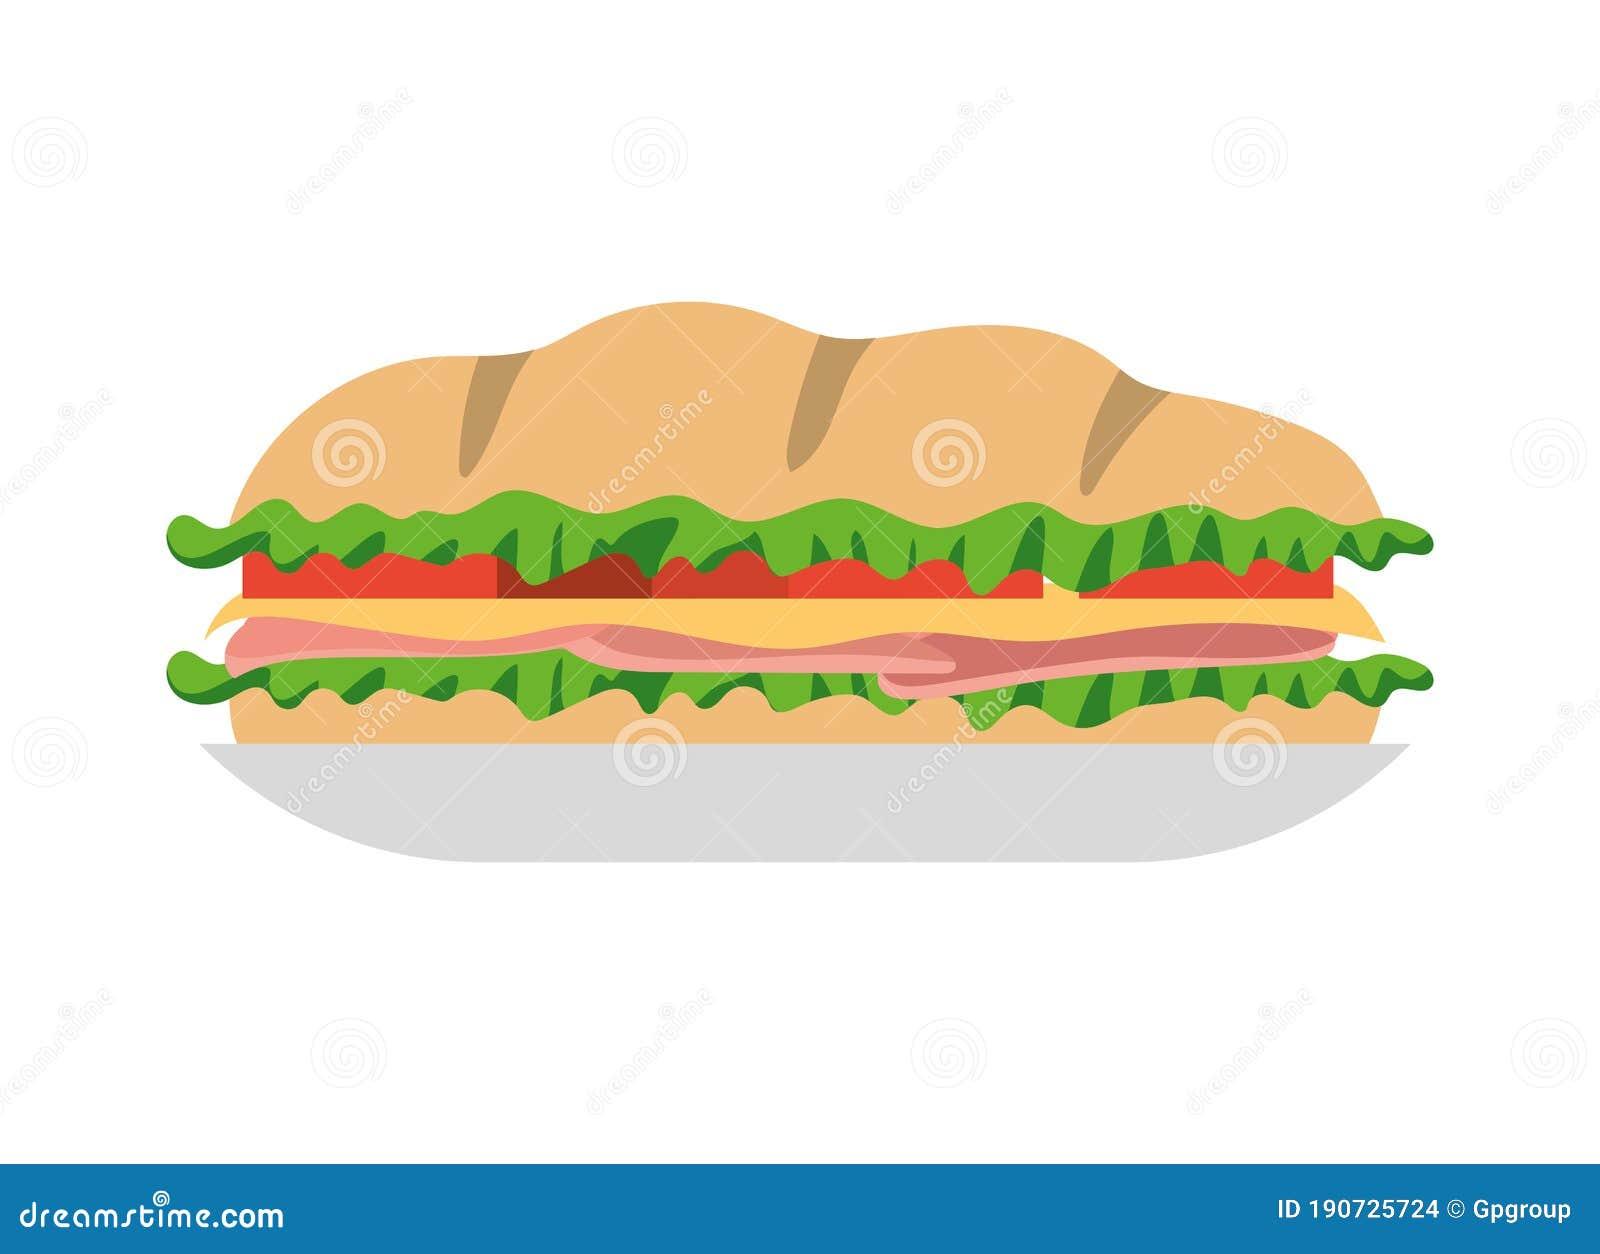 Sandwich On Plate Vector Design Stock Vector Illustration Of Design Dining 190725724